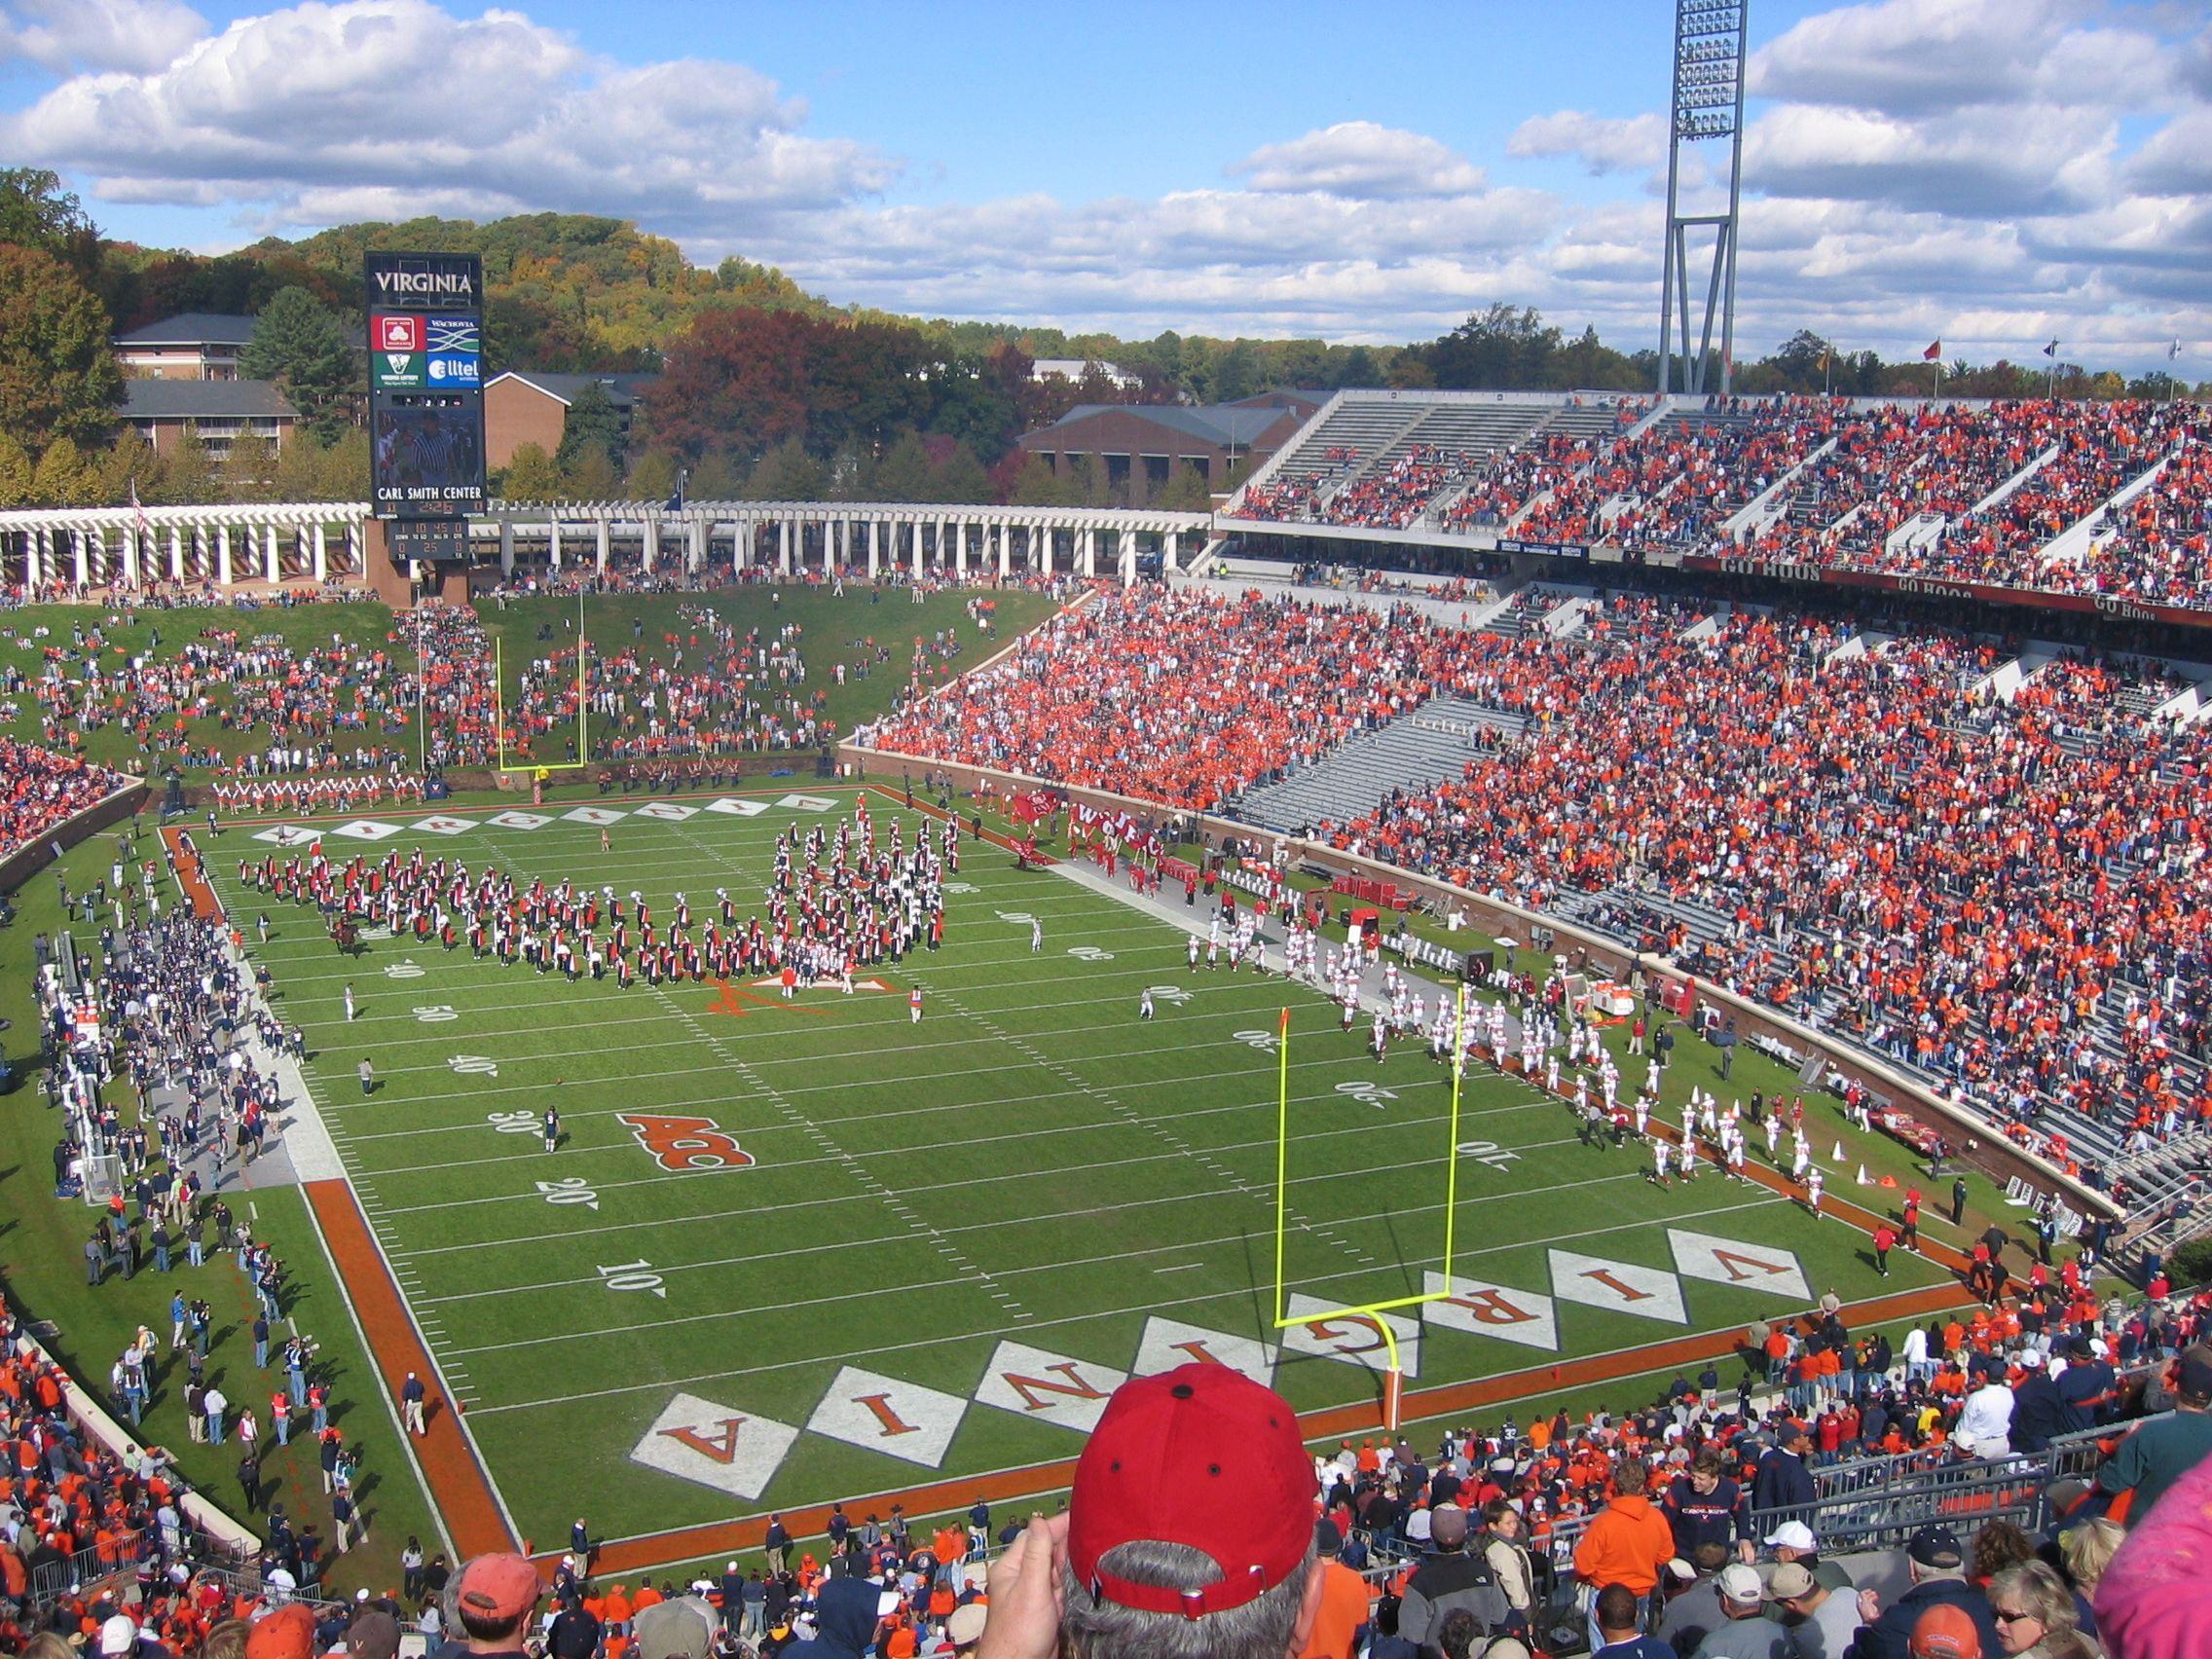 Virginia S Scott Stadium Virginia Uva Cavaliers Football Stadiums Stadium College Football